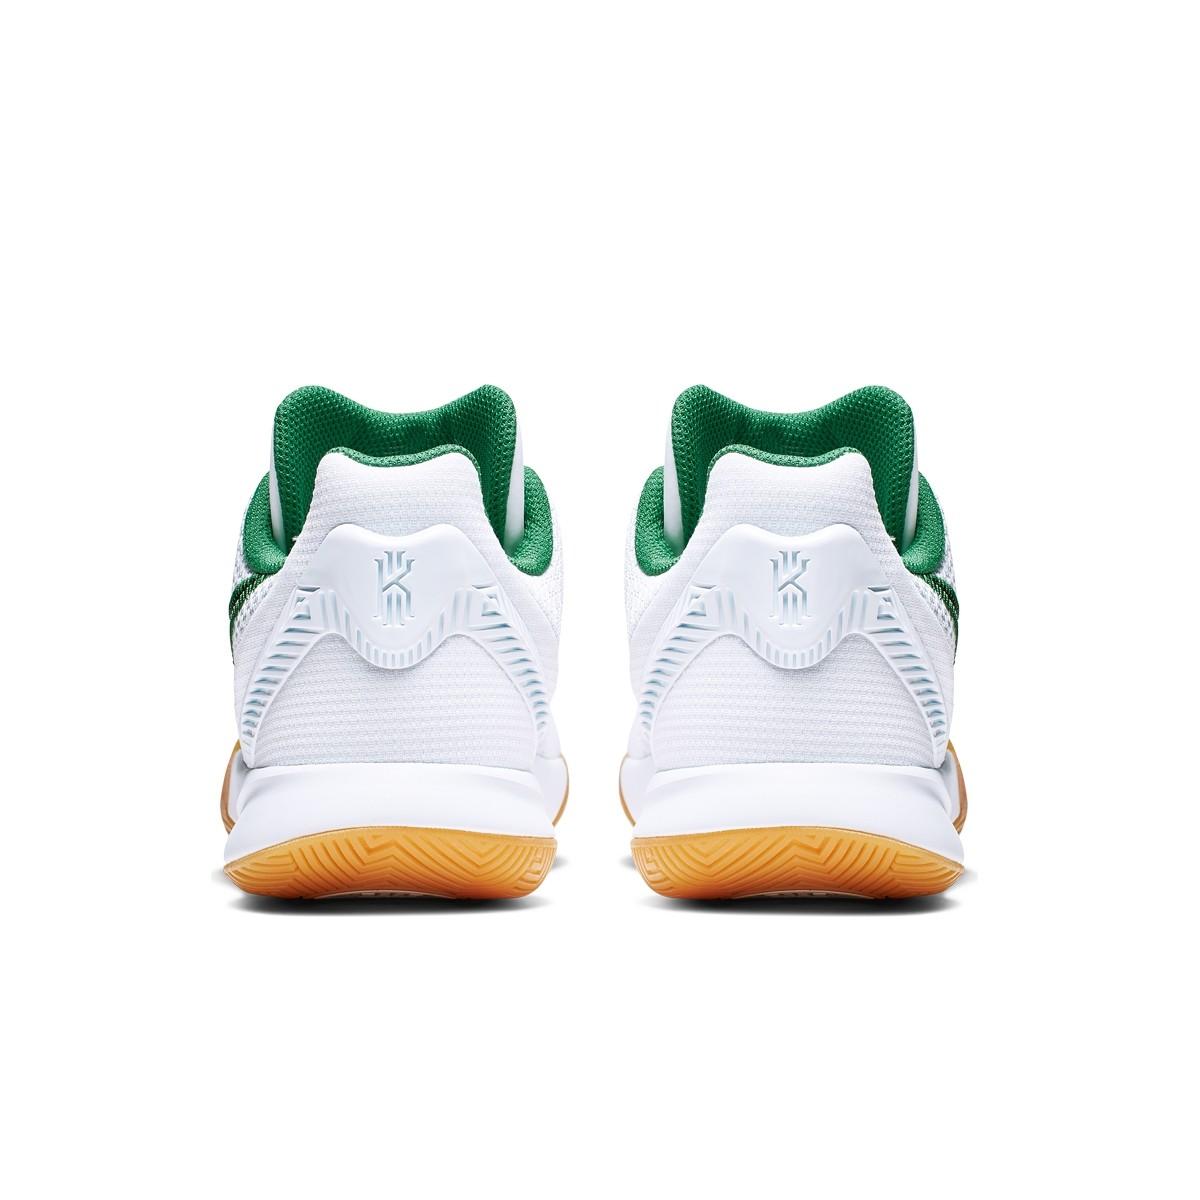 Nike Kyrie Flytrap II GS 'Celtics' AO4436-100